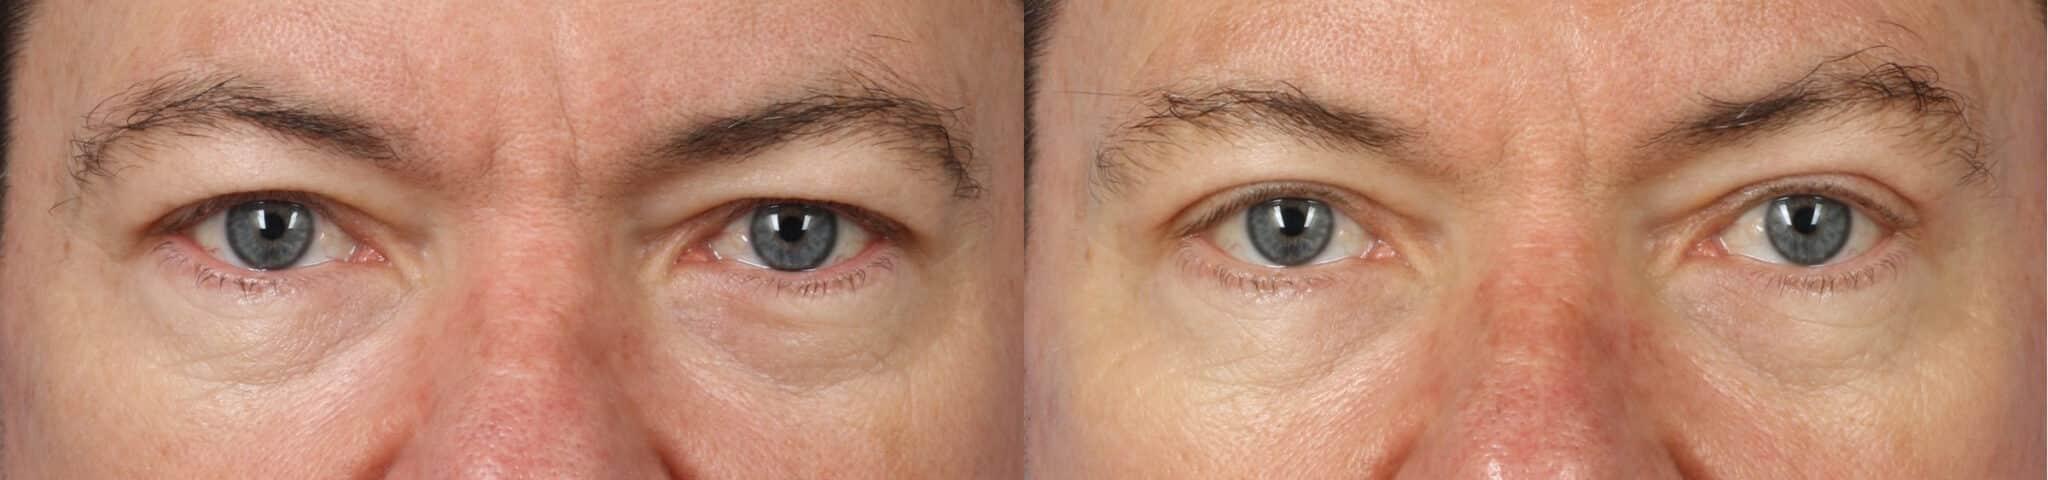 blepharoplasty new york eye surgery